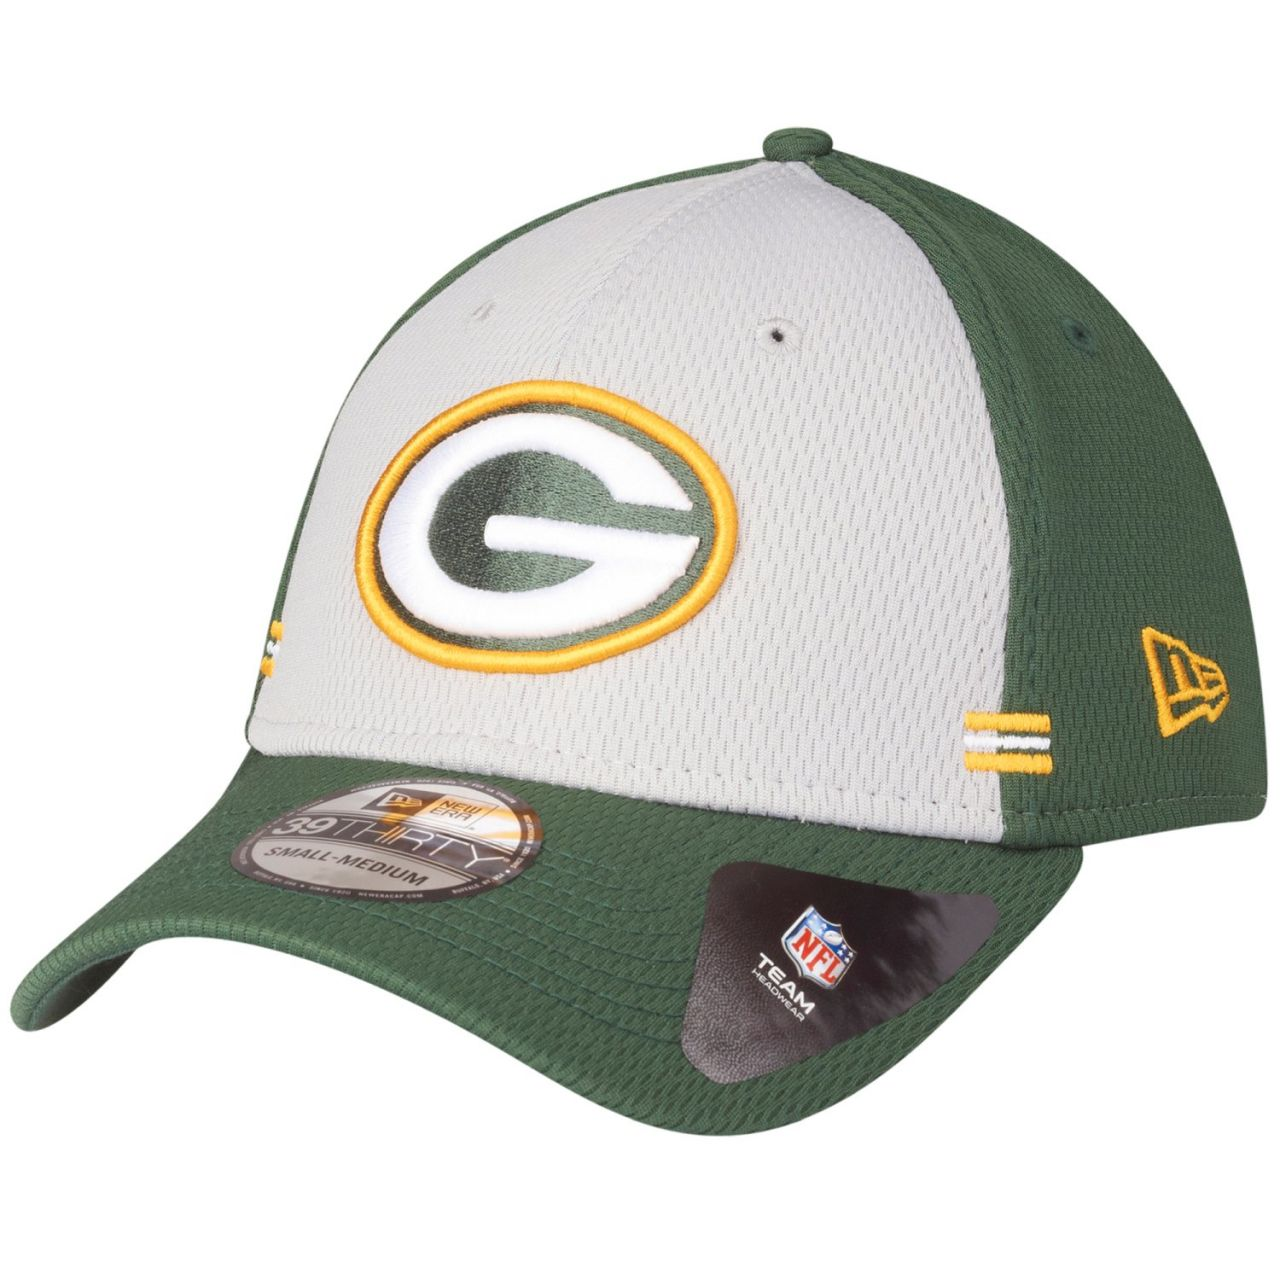 amfoo - New Era 39Thirty Cap - HOMETOWN Green Bay Packers